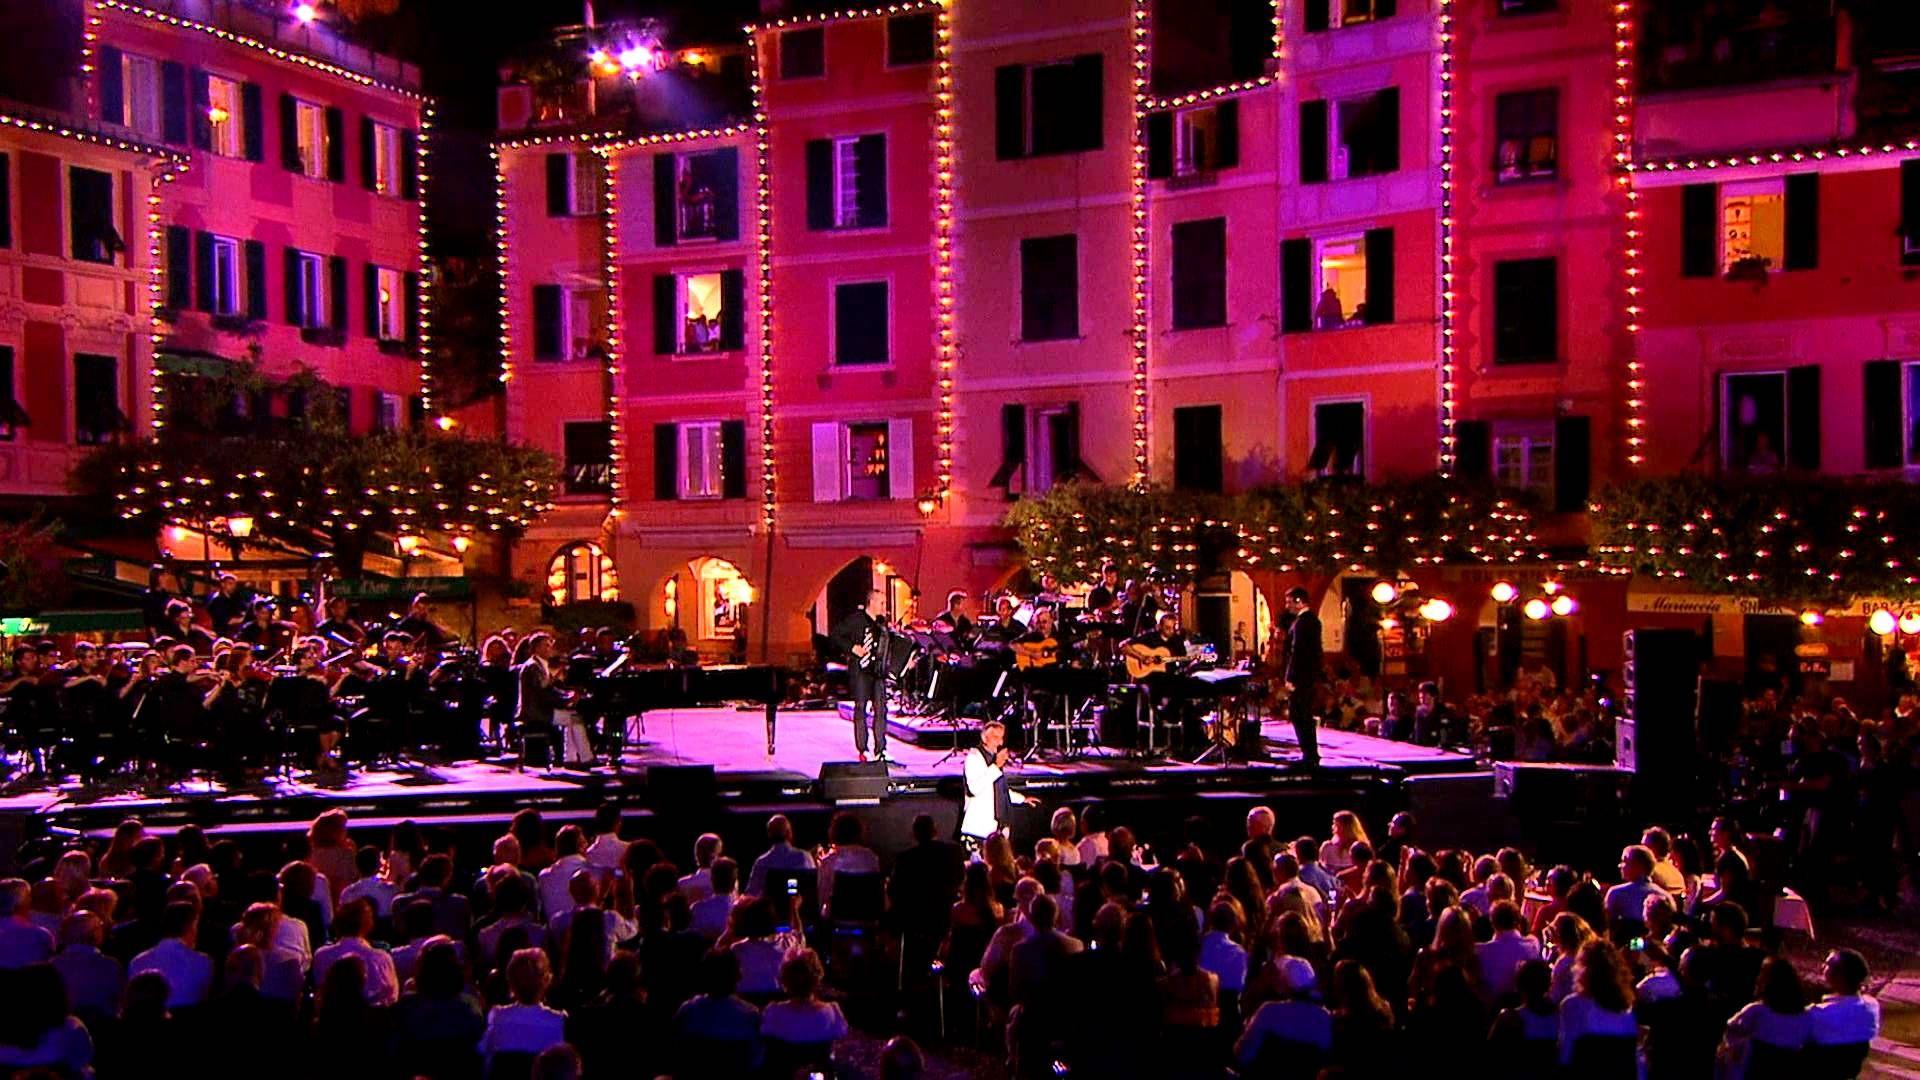 Andrea Bocelli - La Vie En Rose ft. Edith Piaf